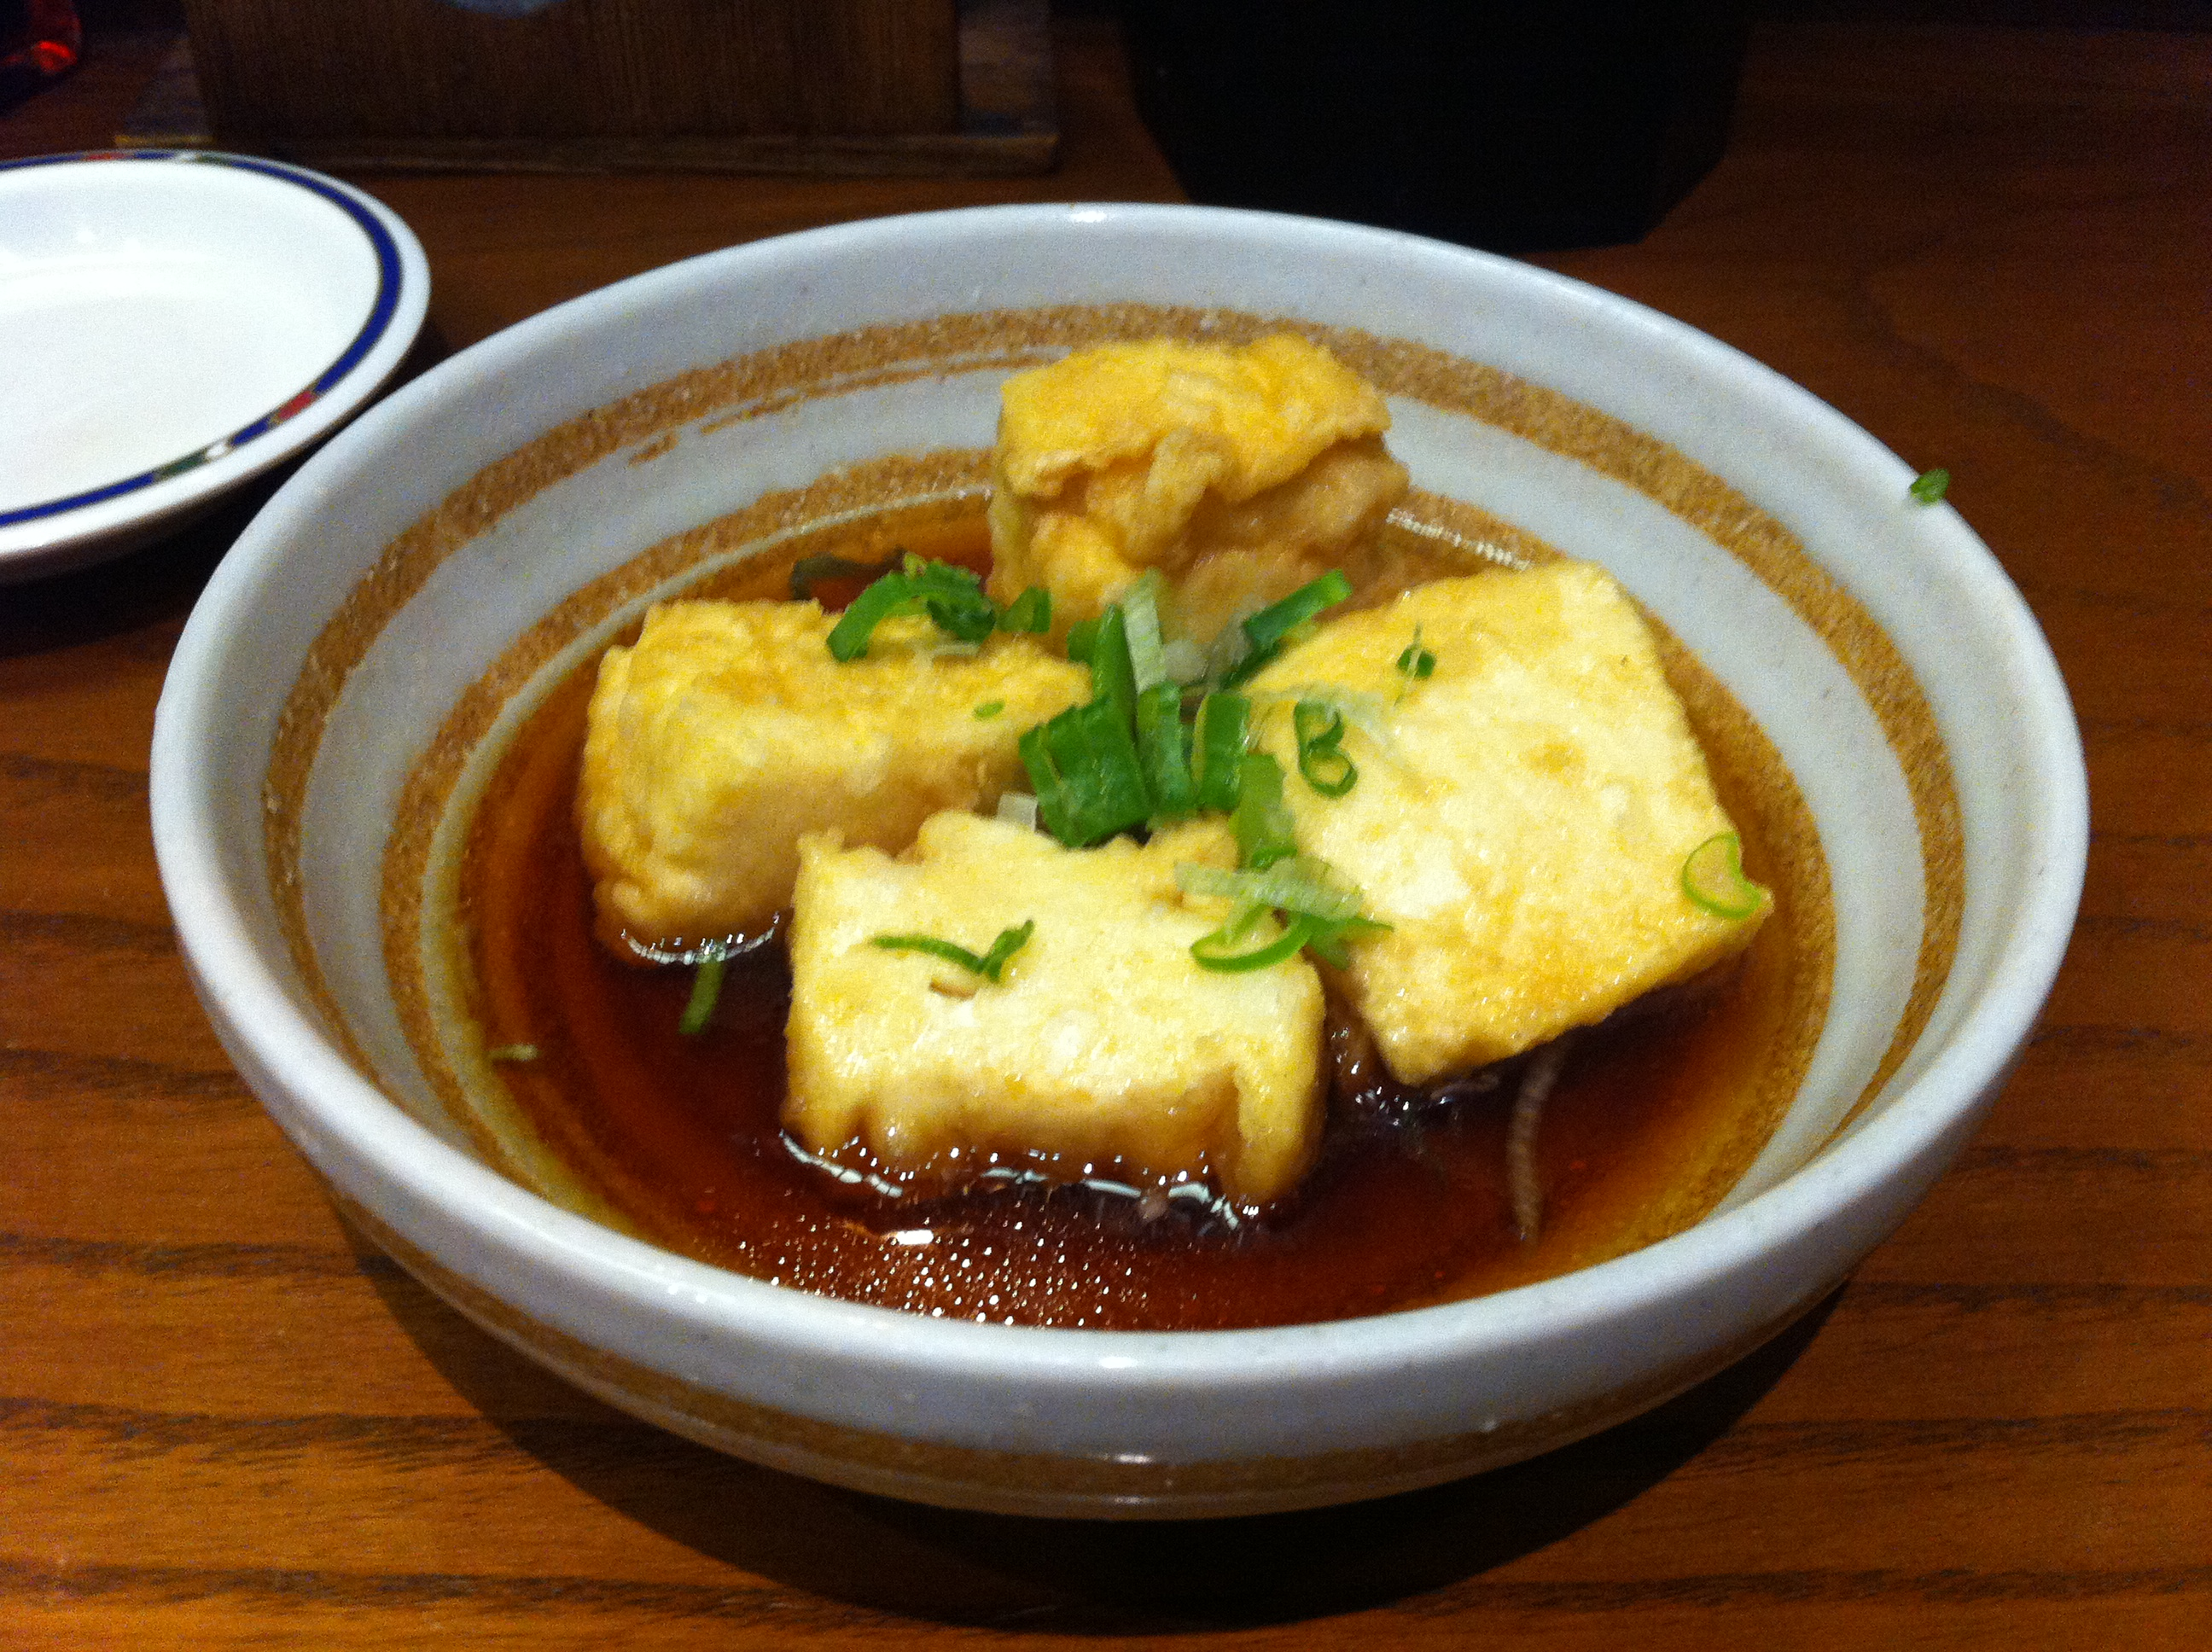 Agedashi tofu at Ten Ten Tei